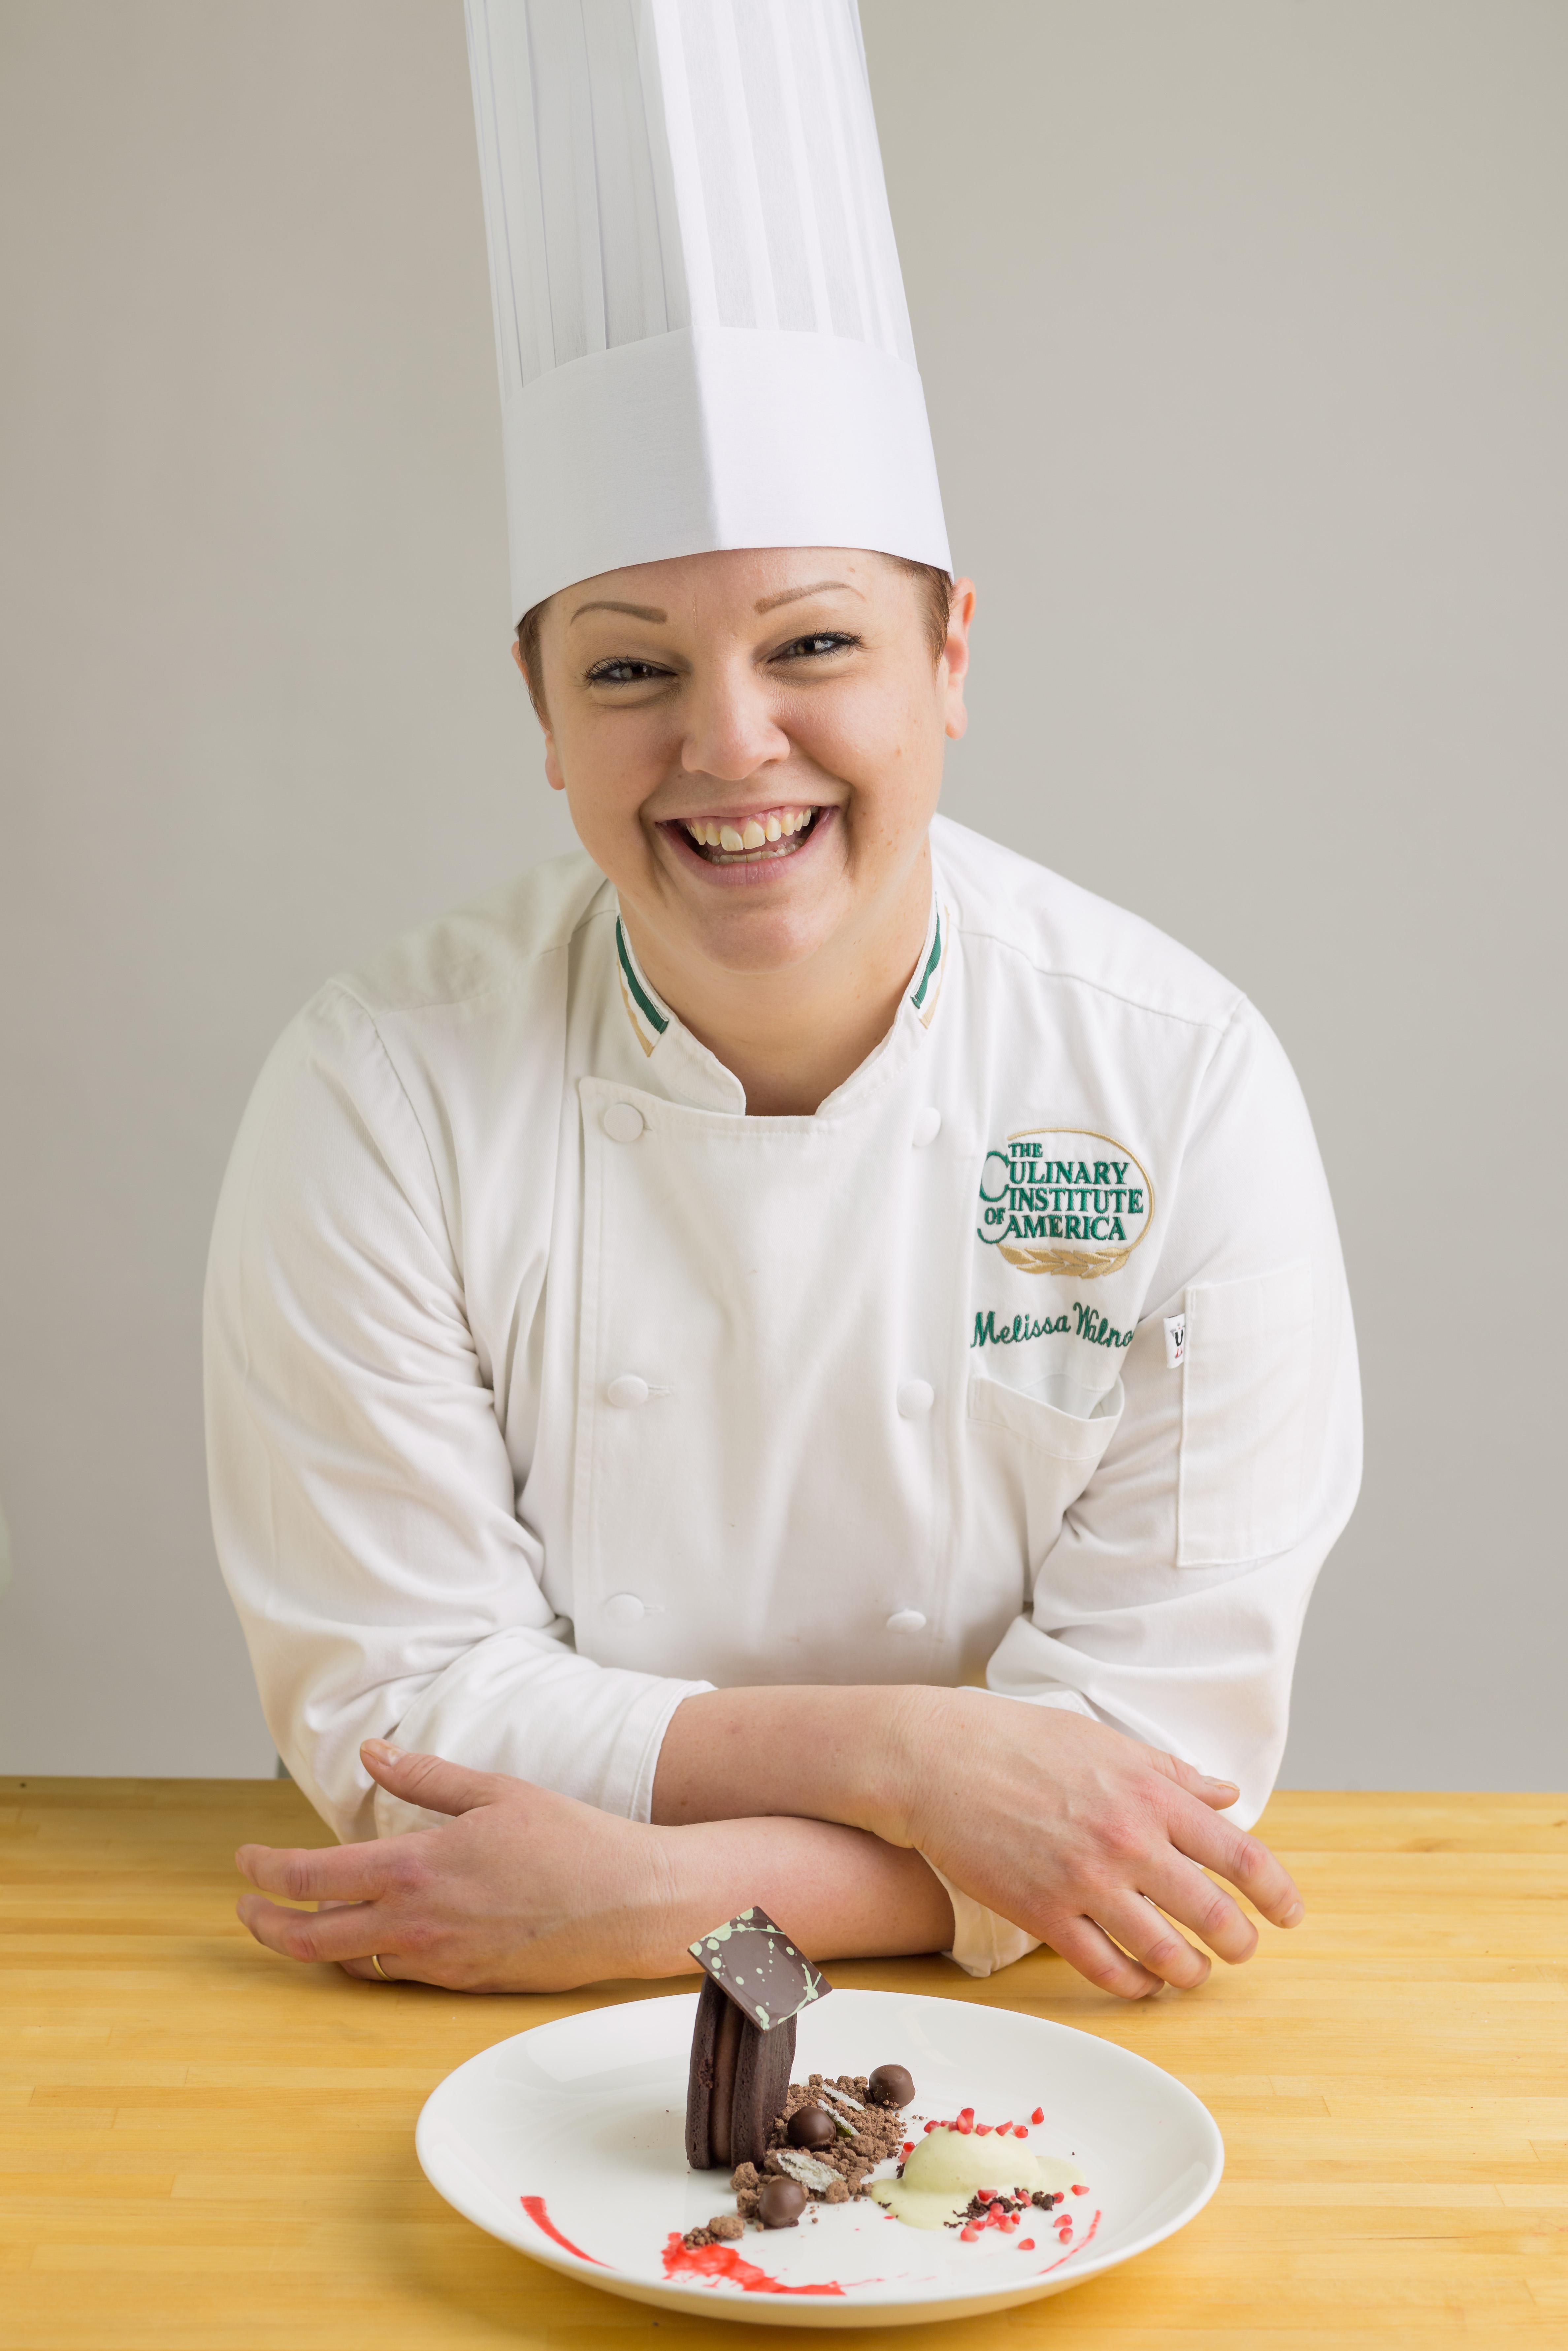 Chef Melissa Walnock